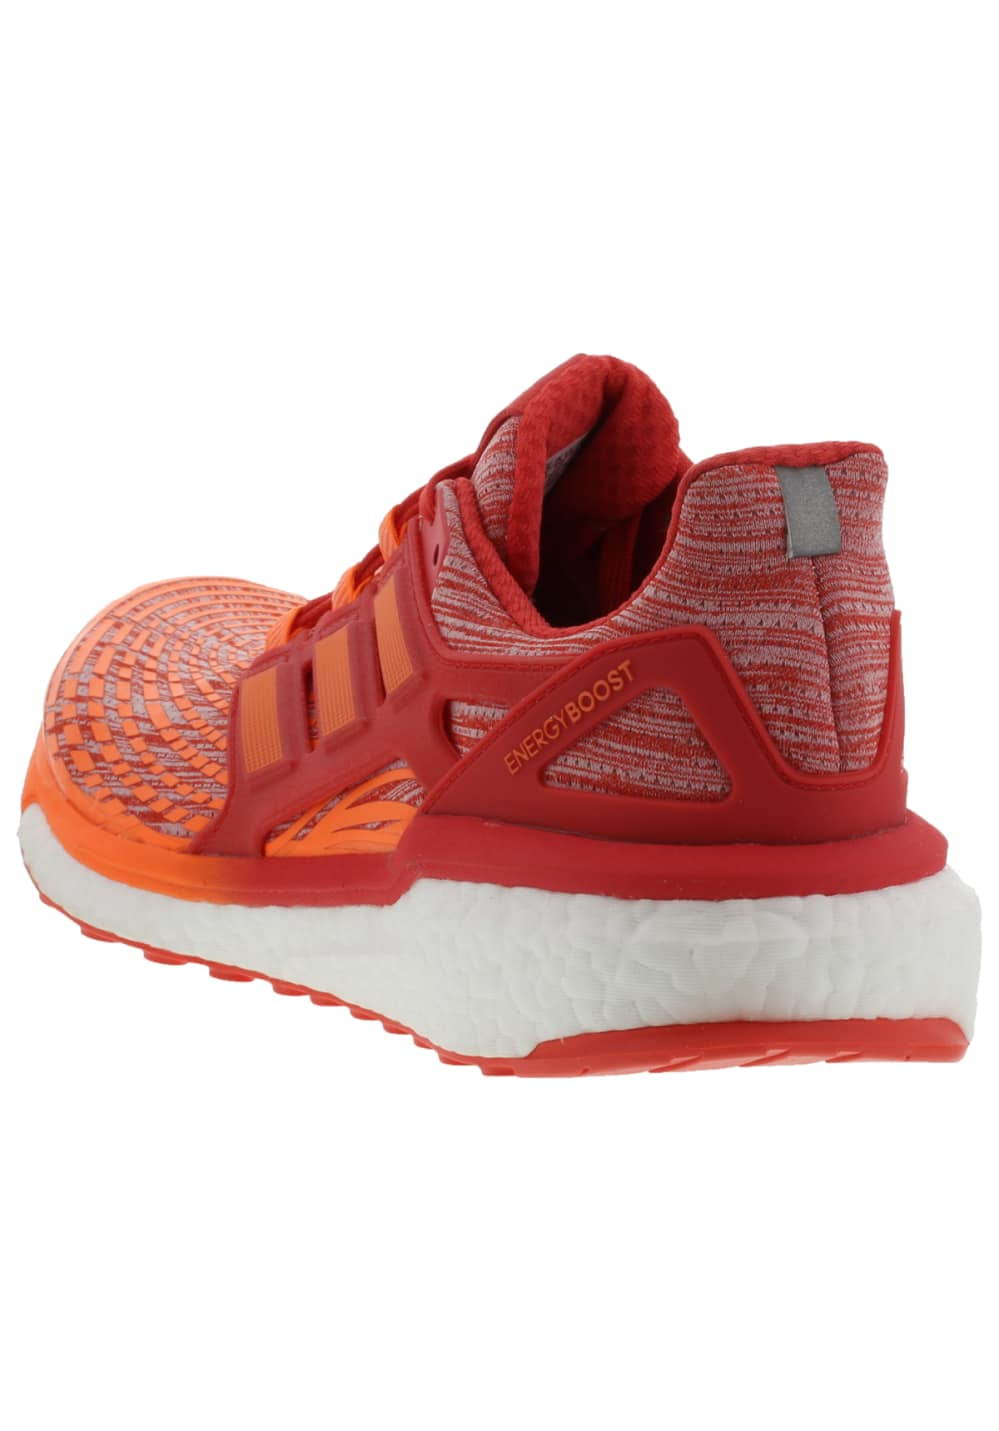 Orange Energy Adidas Chaussures Running Pour Femme Boost 3jq54LAR